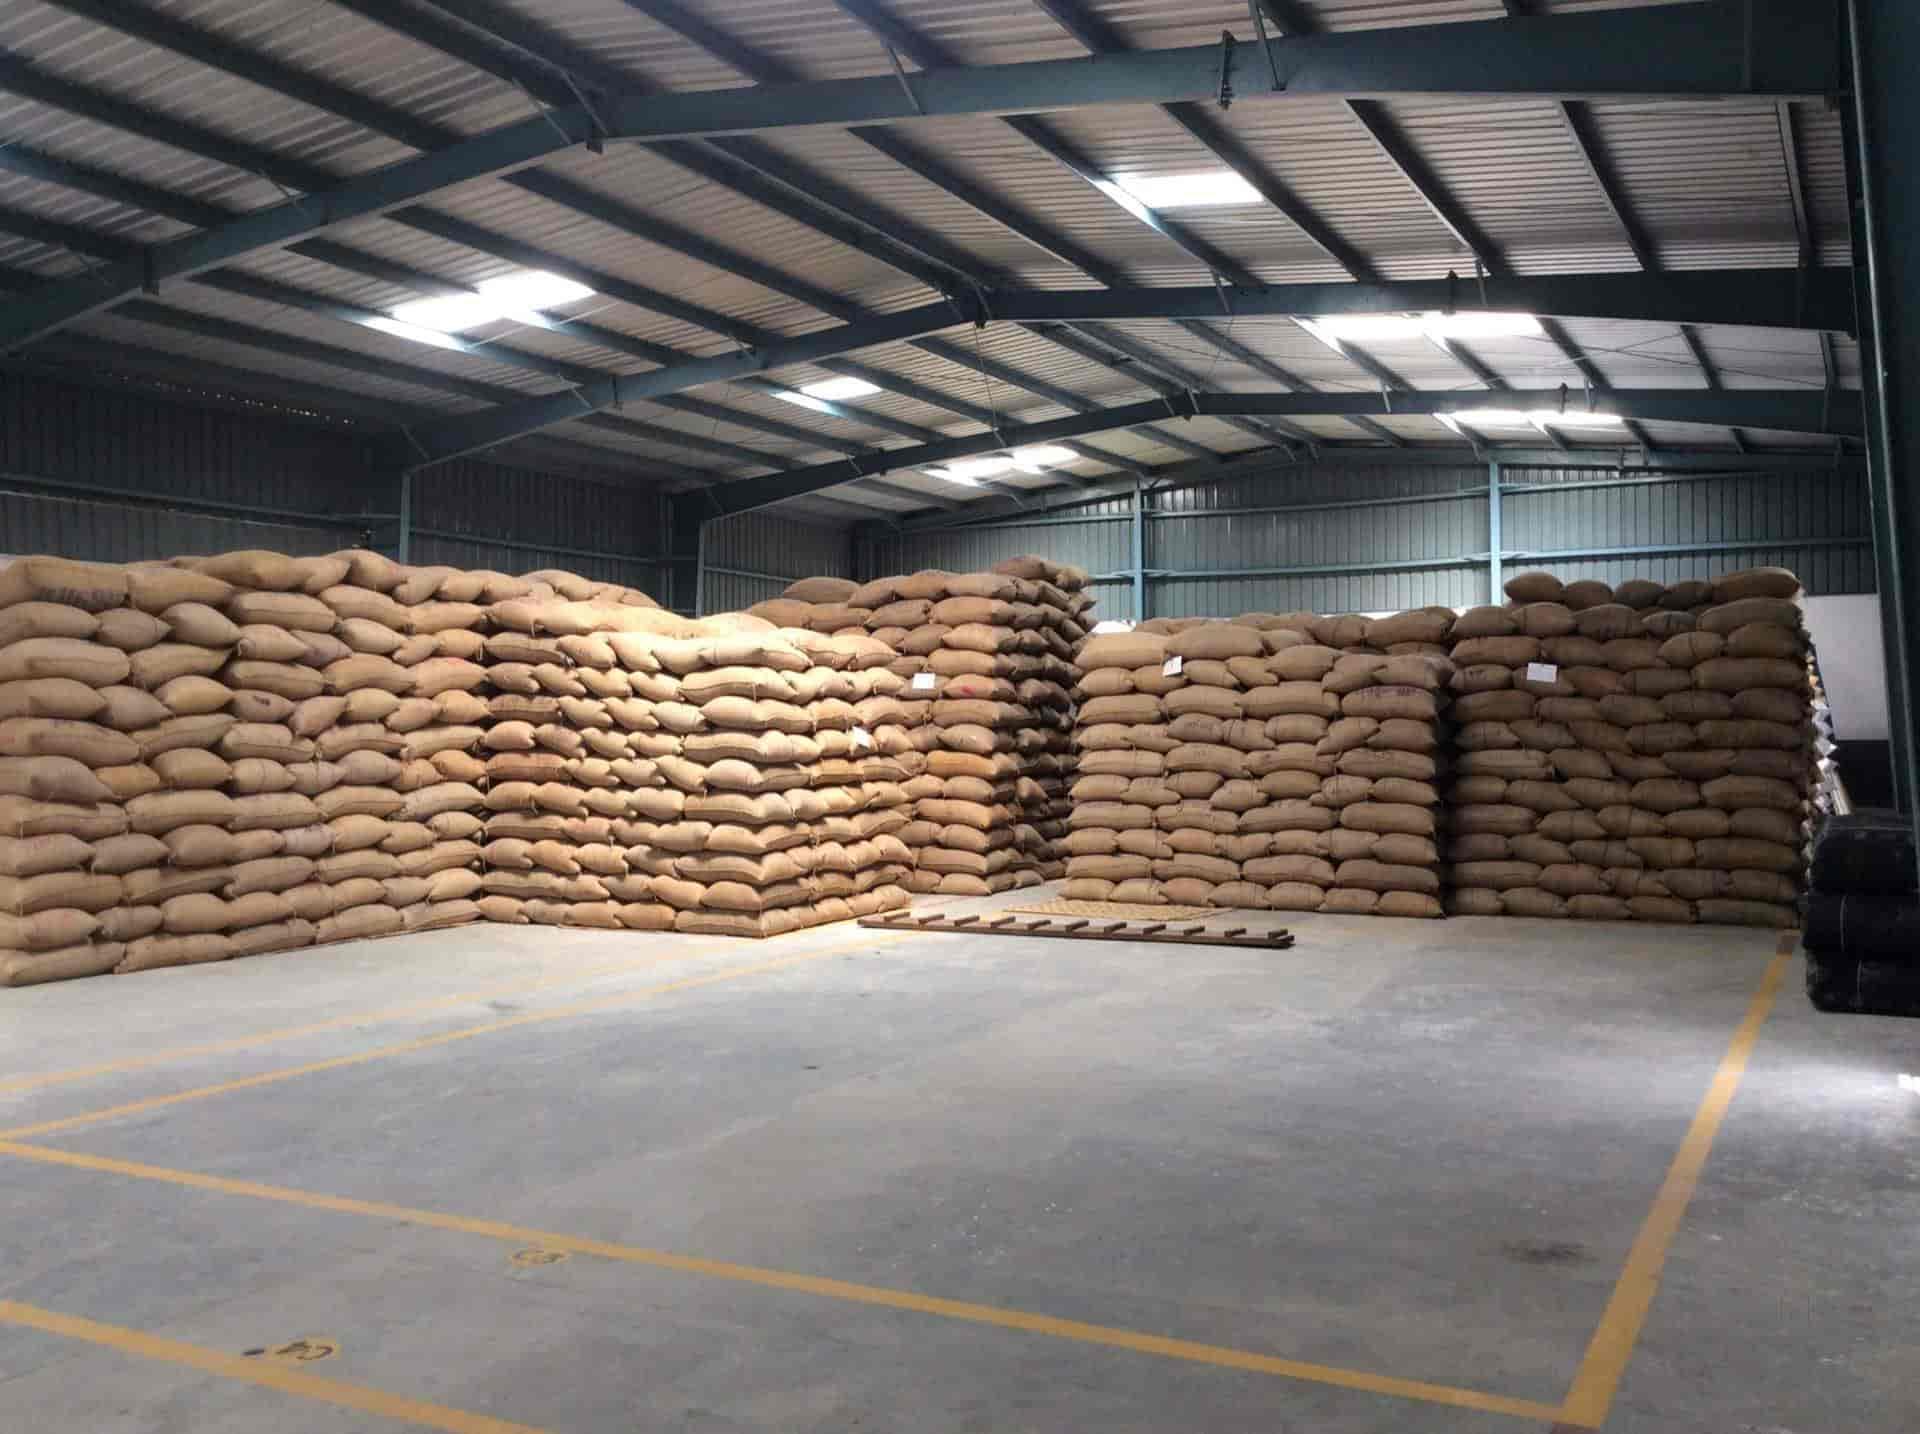 Samruddhi Cold Storage And Warehousing Photos, Hagloor, Solapur